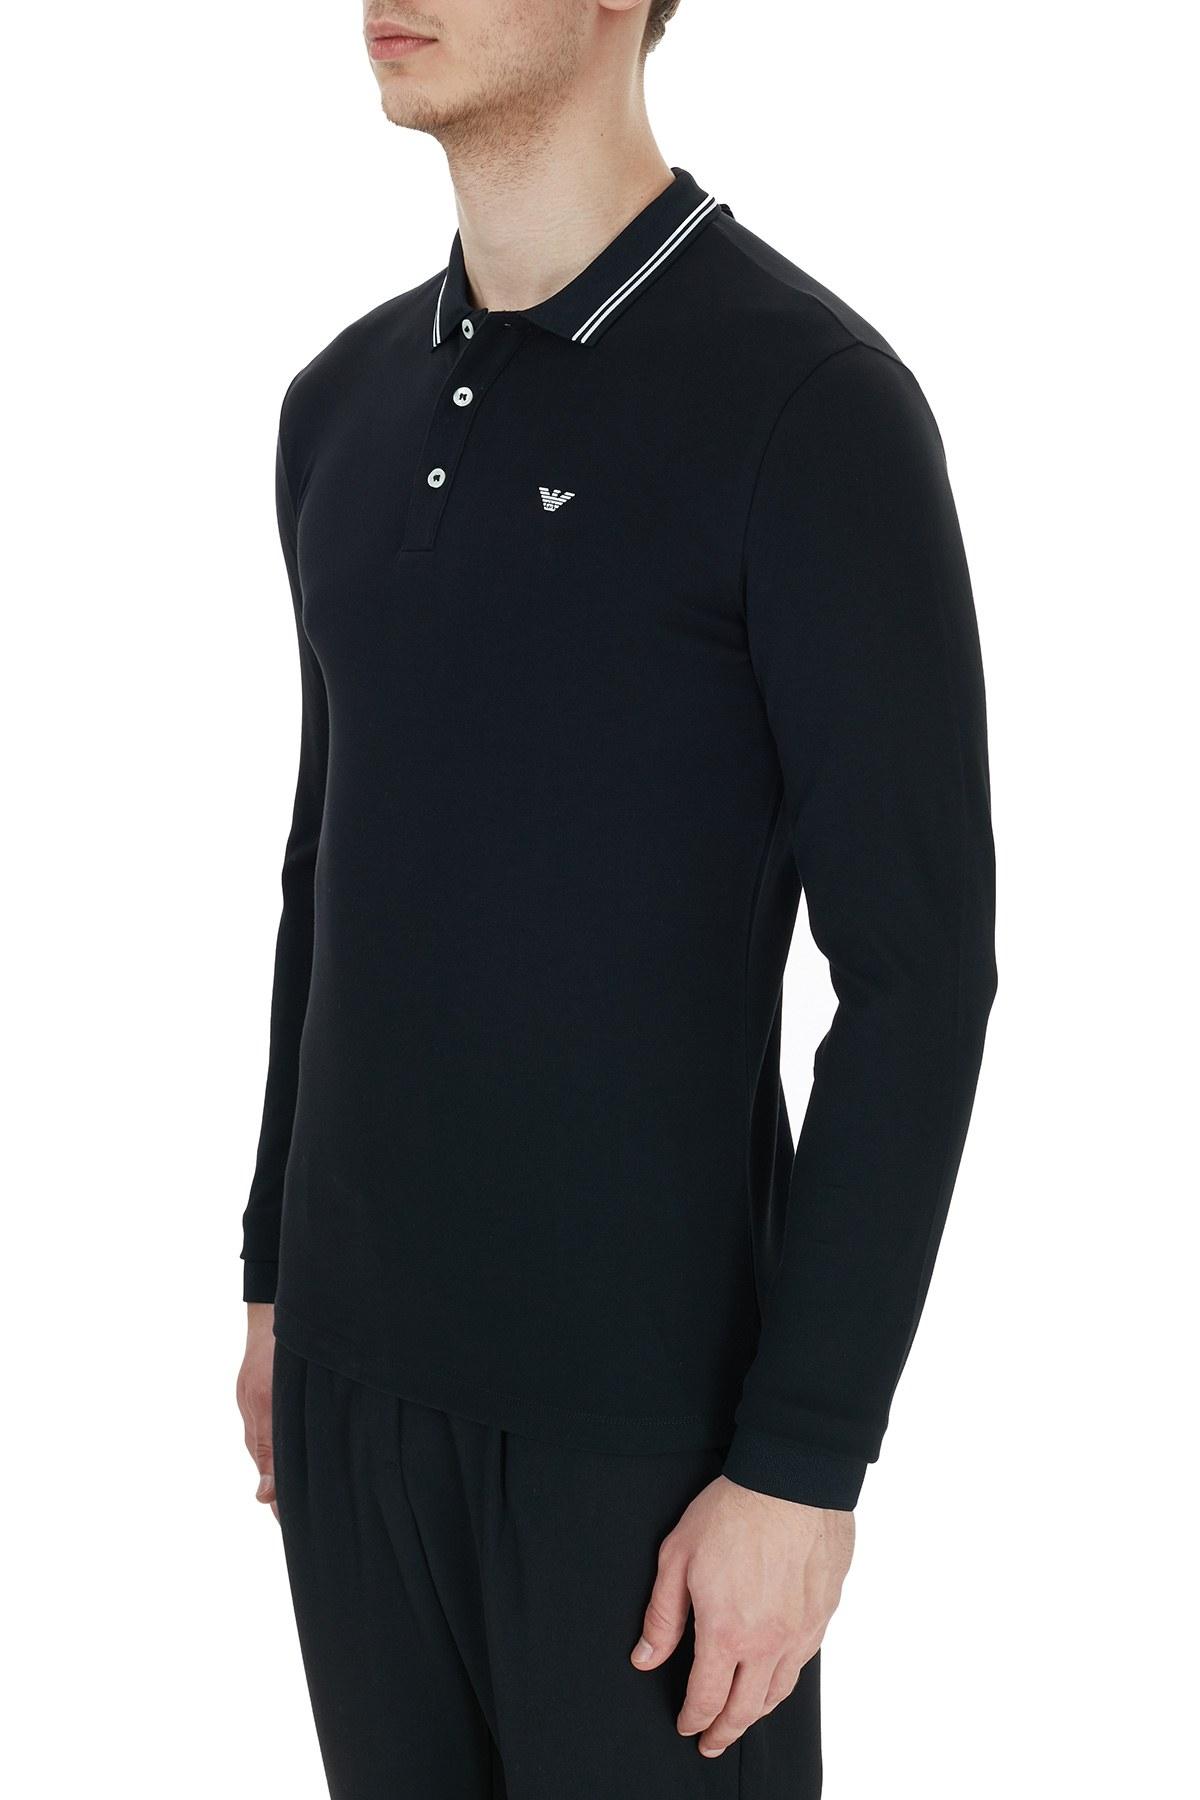 Emporio Armani Pamuklu Düğmeli T Shirt Erkek Polo 8N1F36 1JPTZ 0999 SİYAH